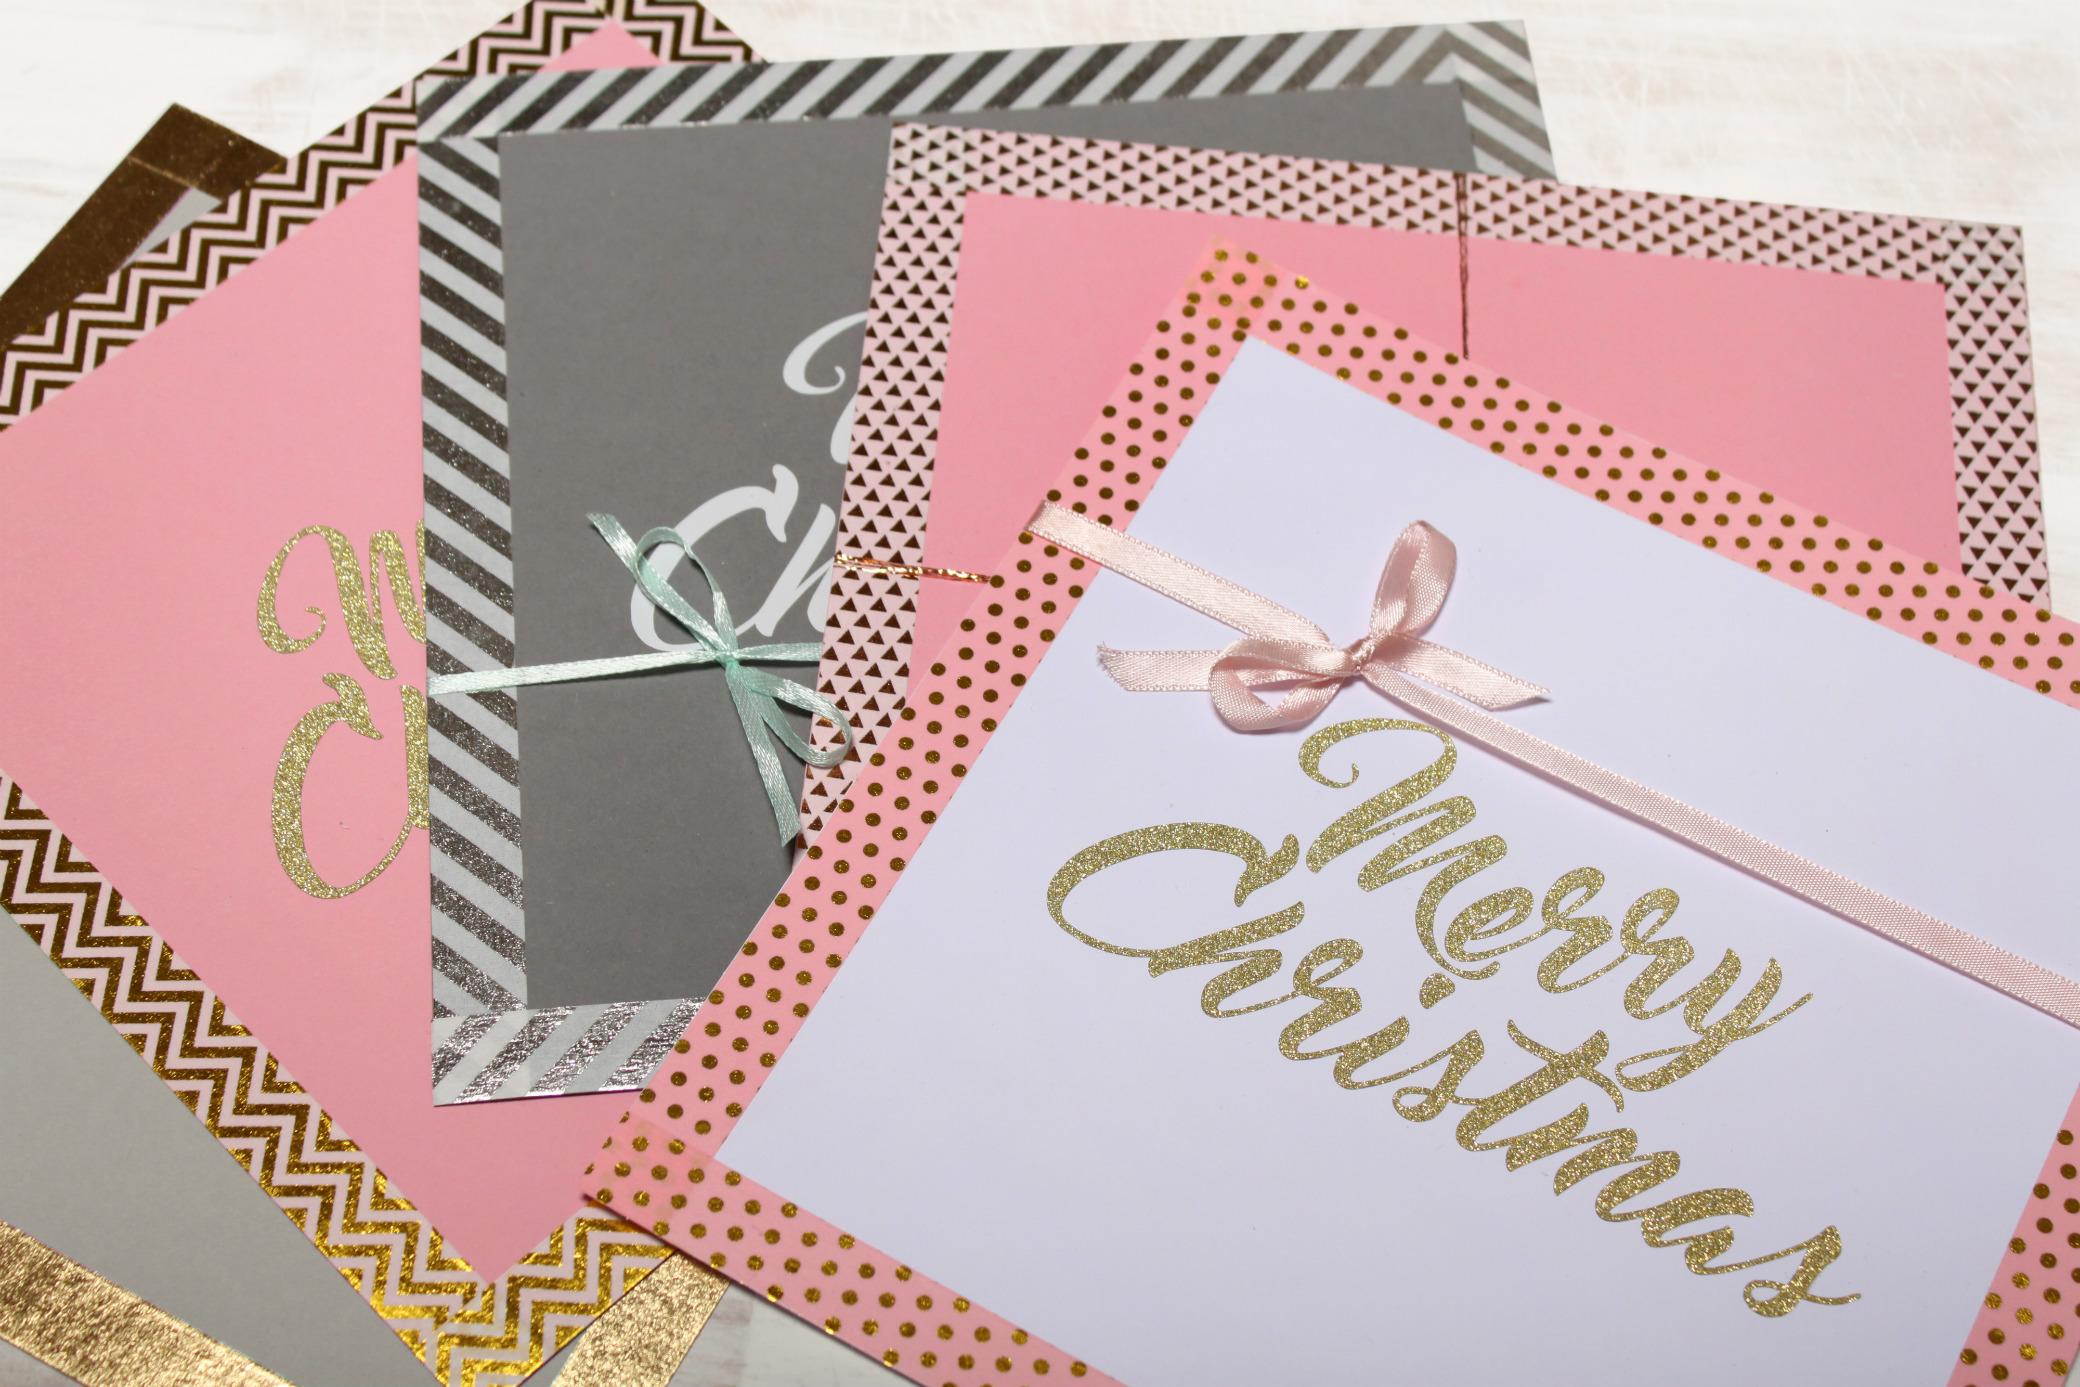 adventskalender t rchen nr 13 karten basteln mit washi tape gewinner stoffverlsoung blog. Black Bedroom Furniture Sets. Home Design Ideas